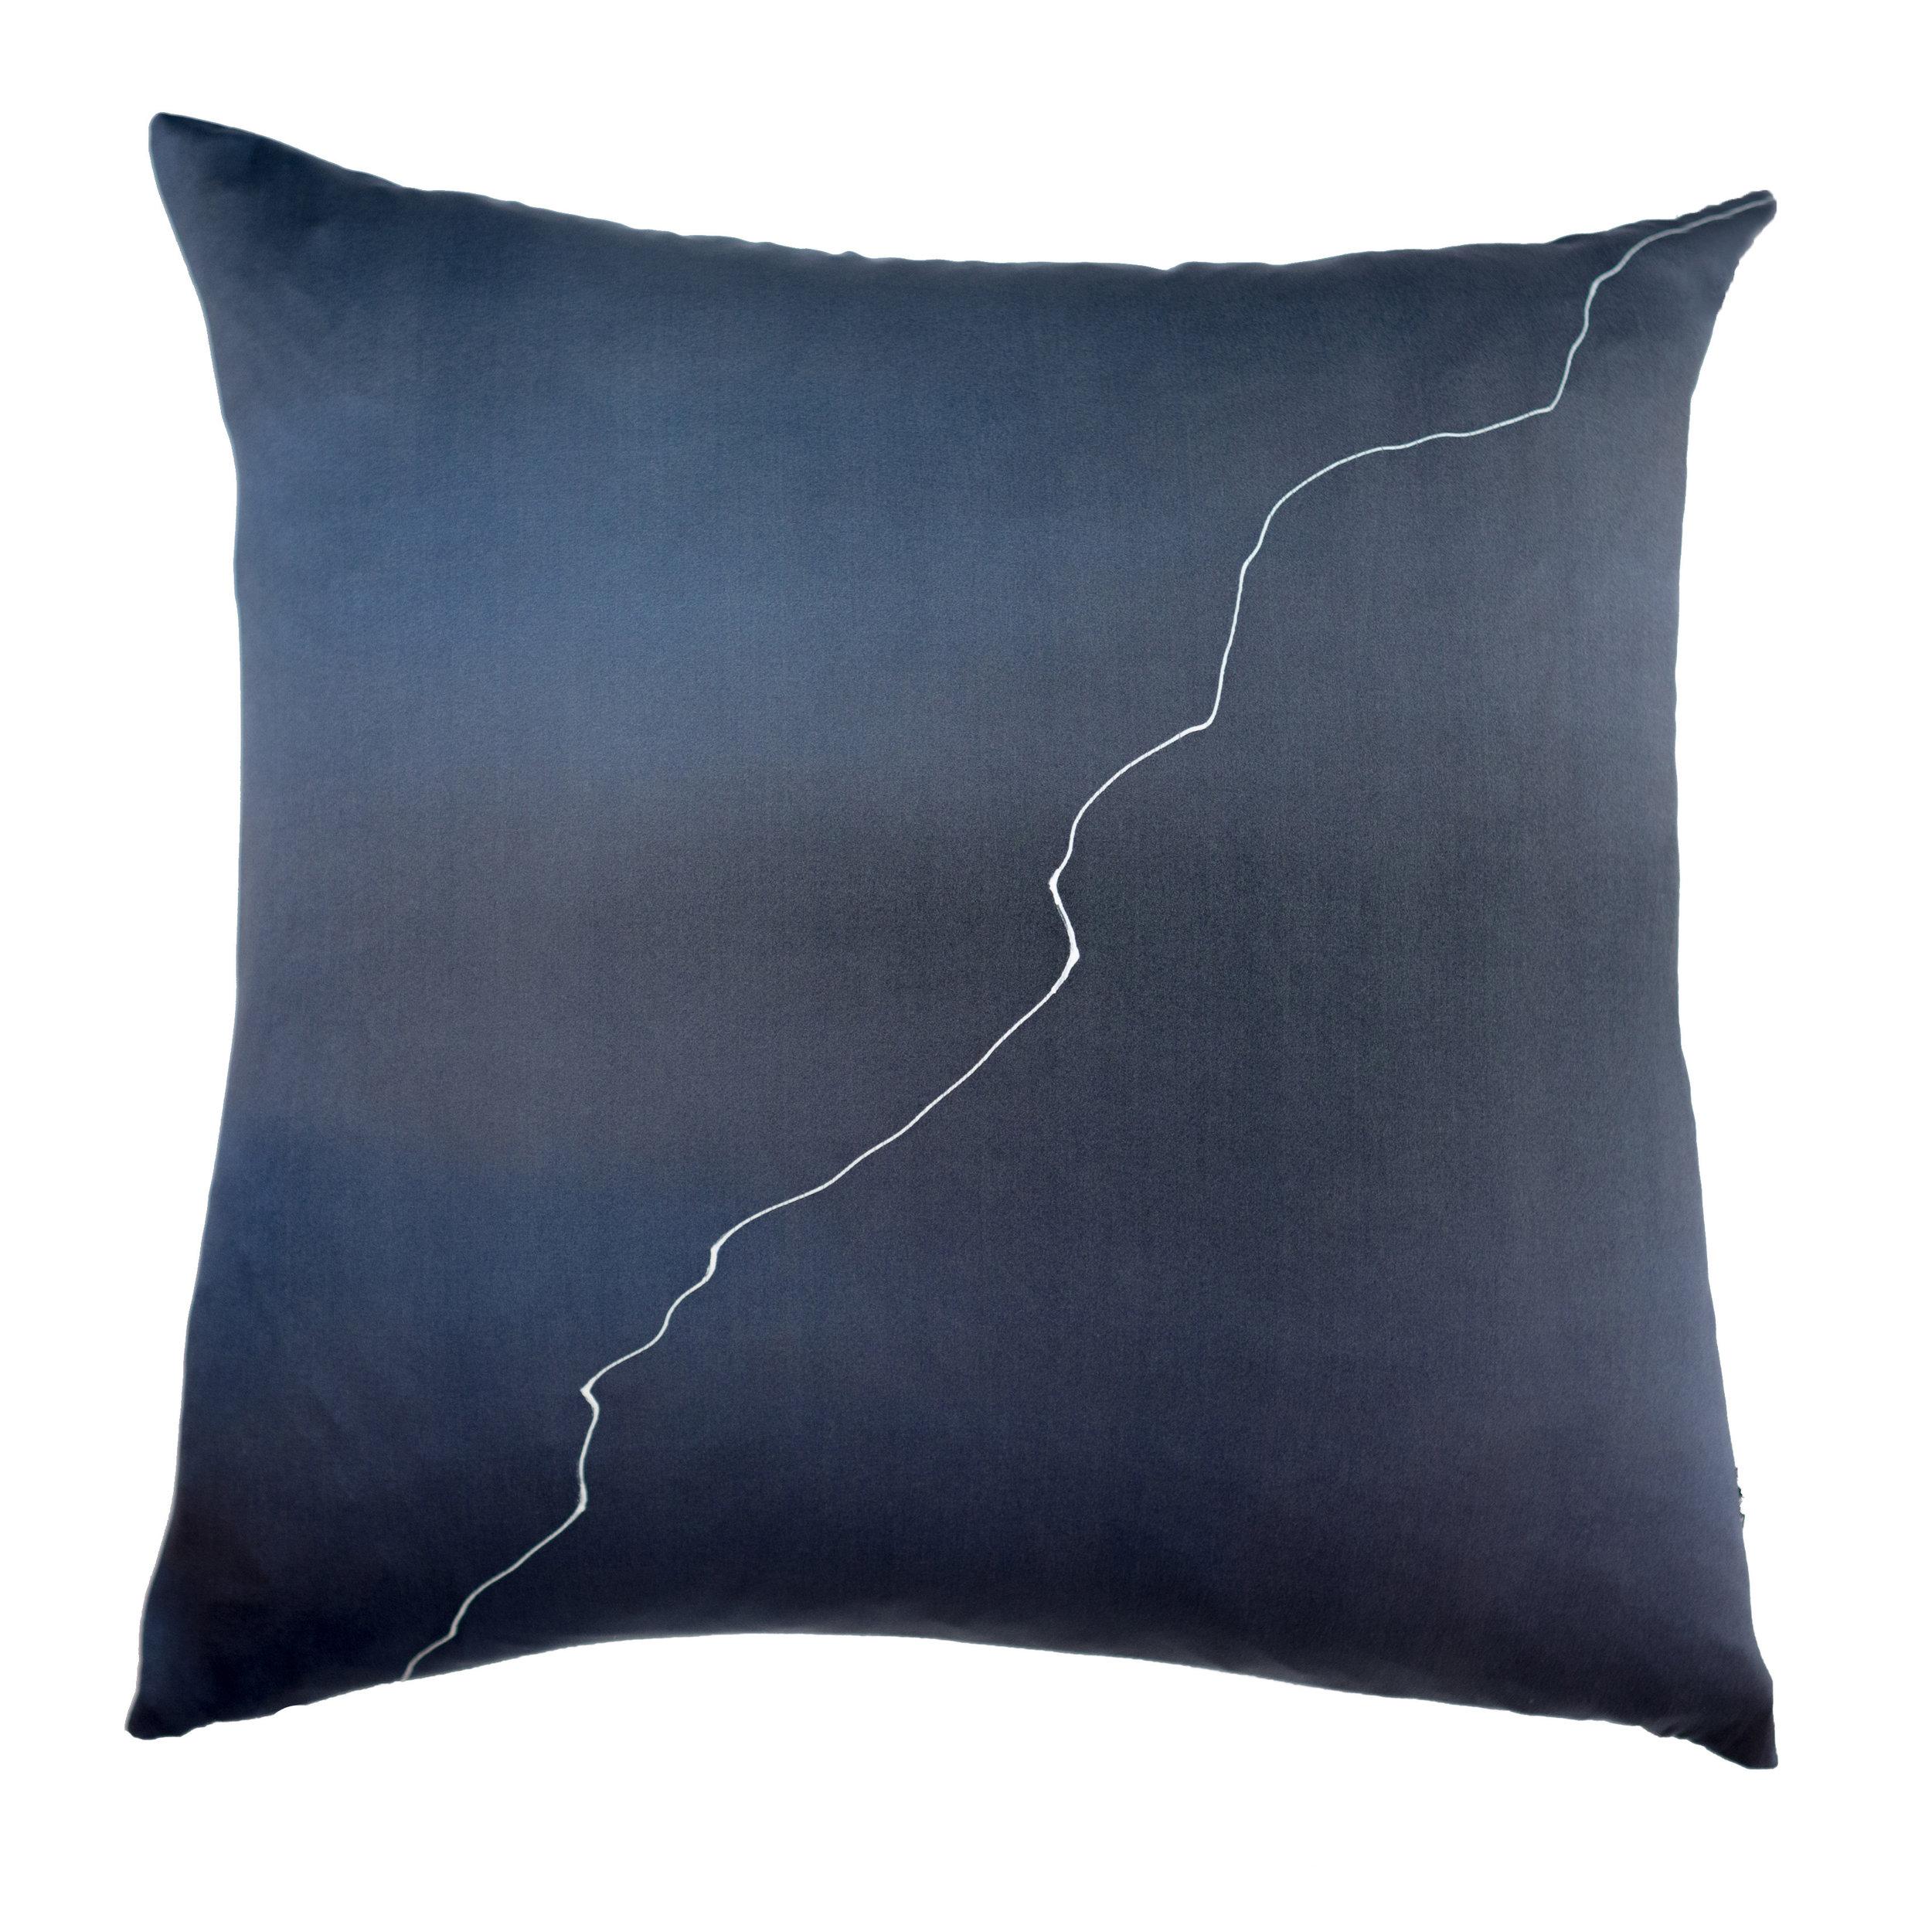 Marie-Burgos-Design.Yin & Yang-Pillow.MBcollection.jpg